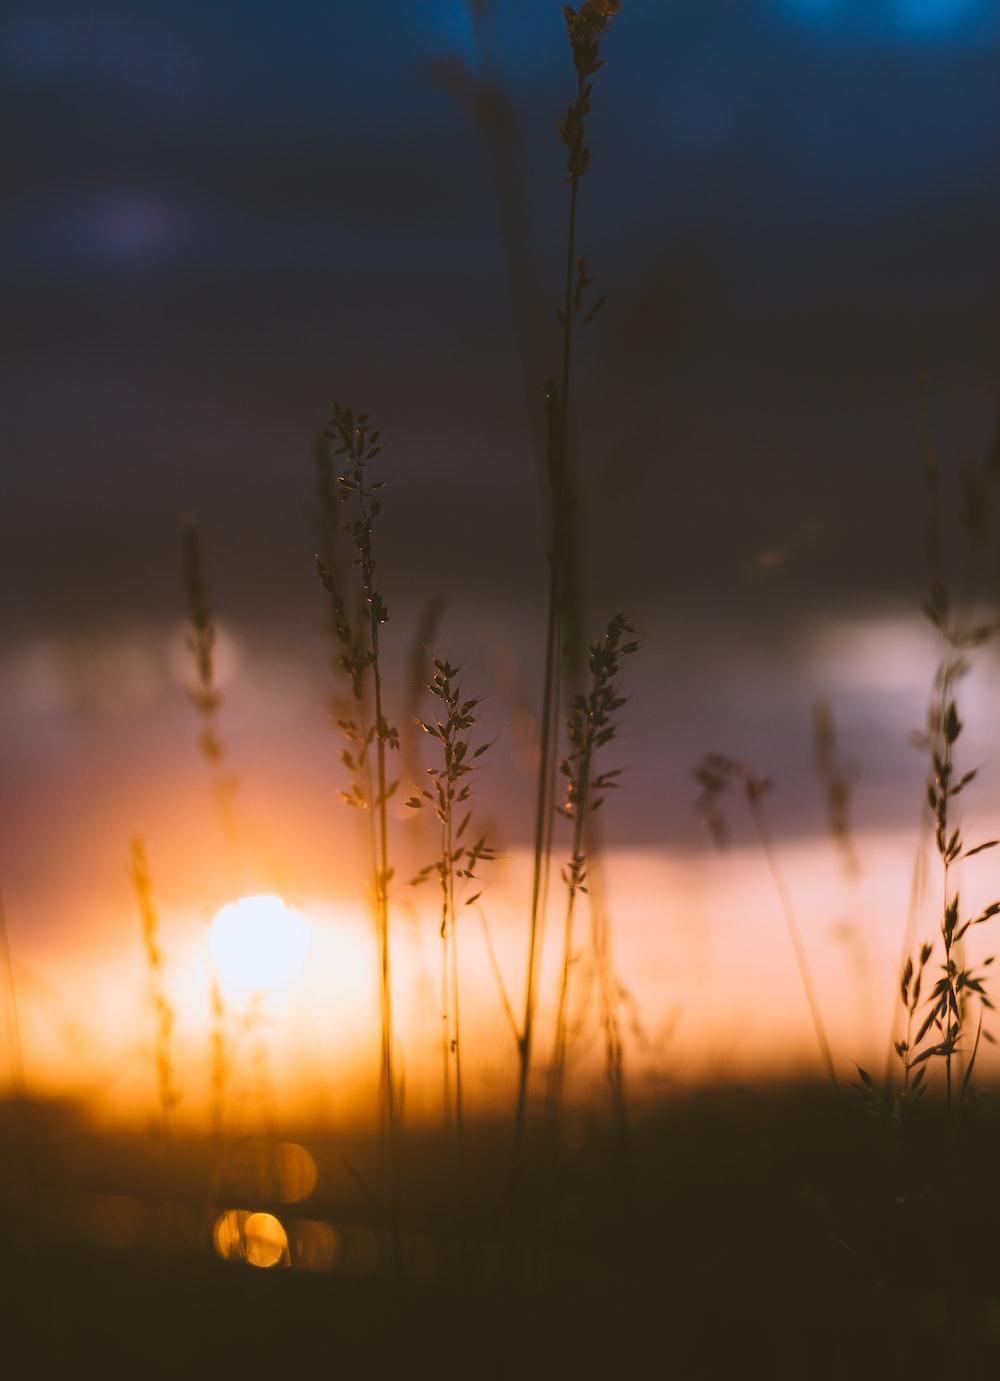 Setting Sun Behind Blades Of Grass